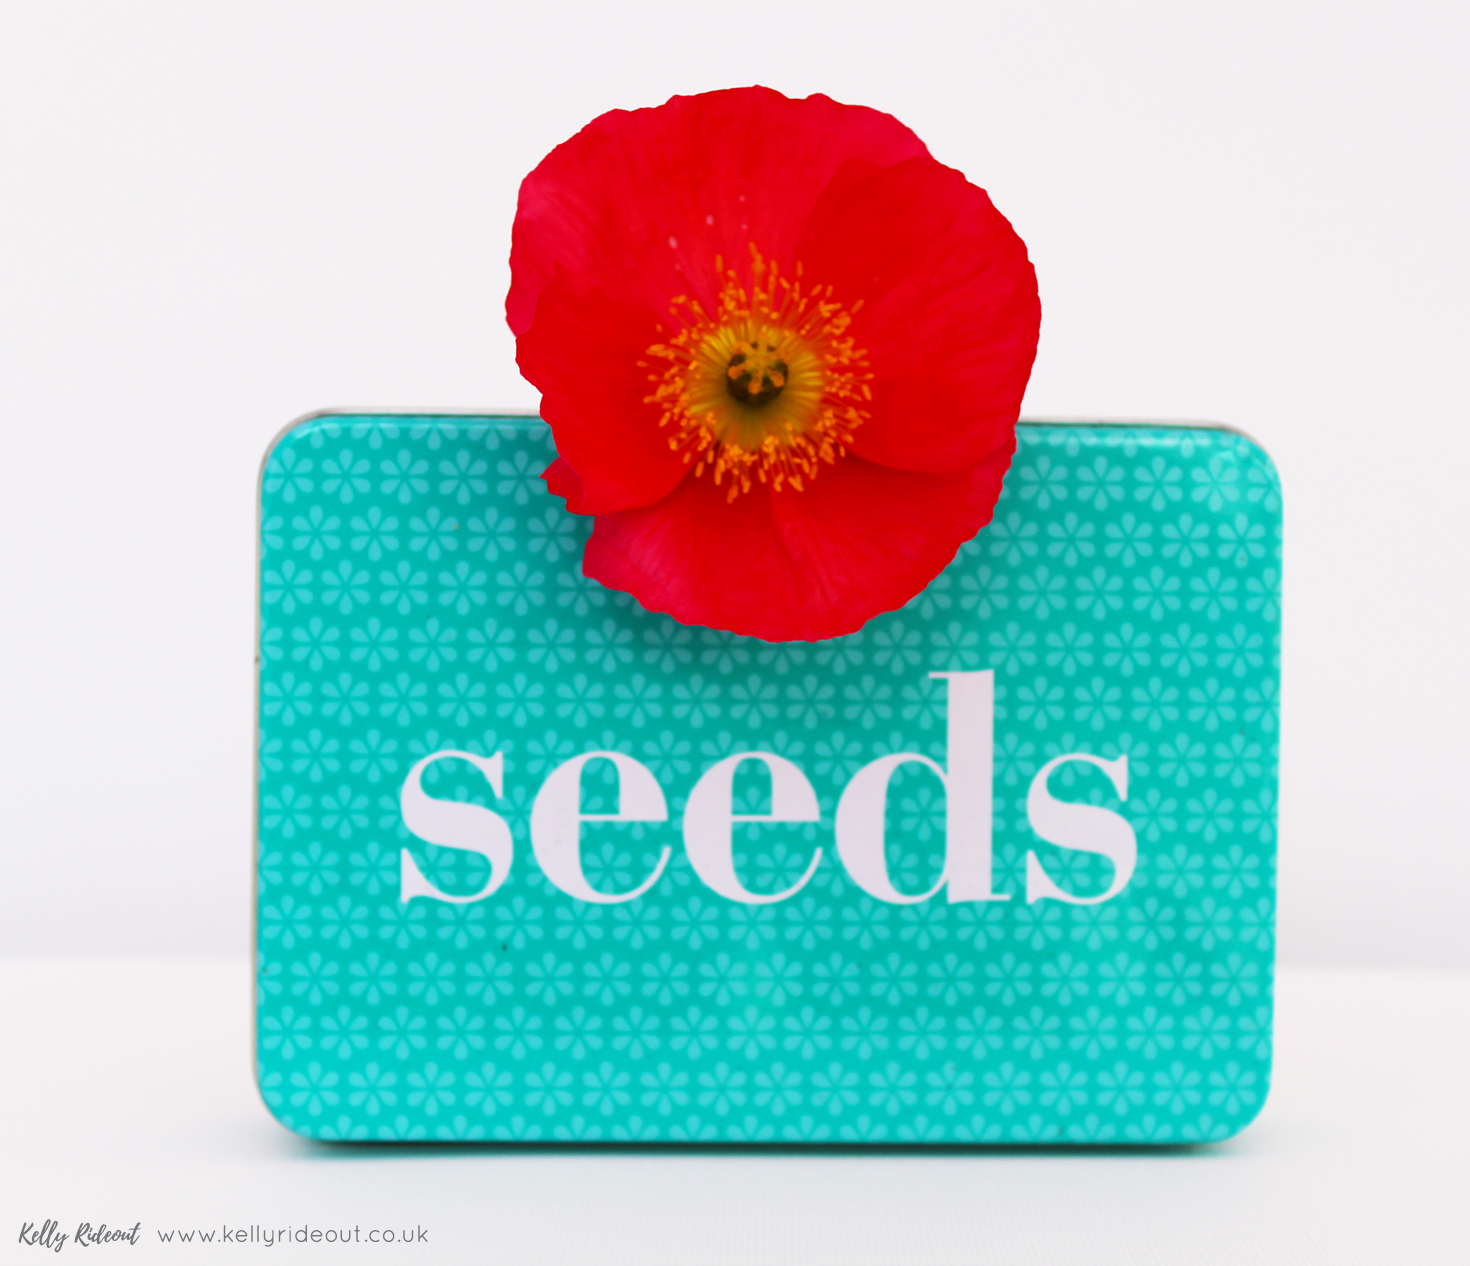 Seeds Iceland Poppies.jpg